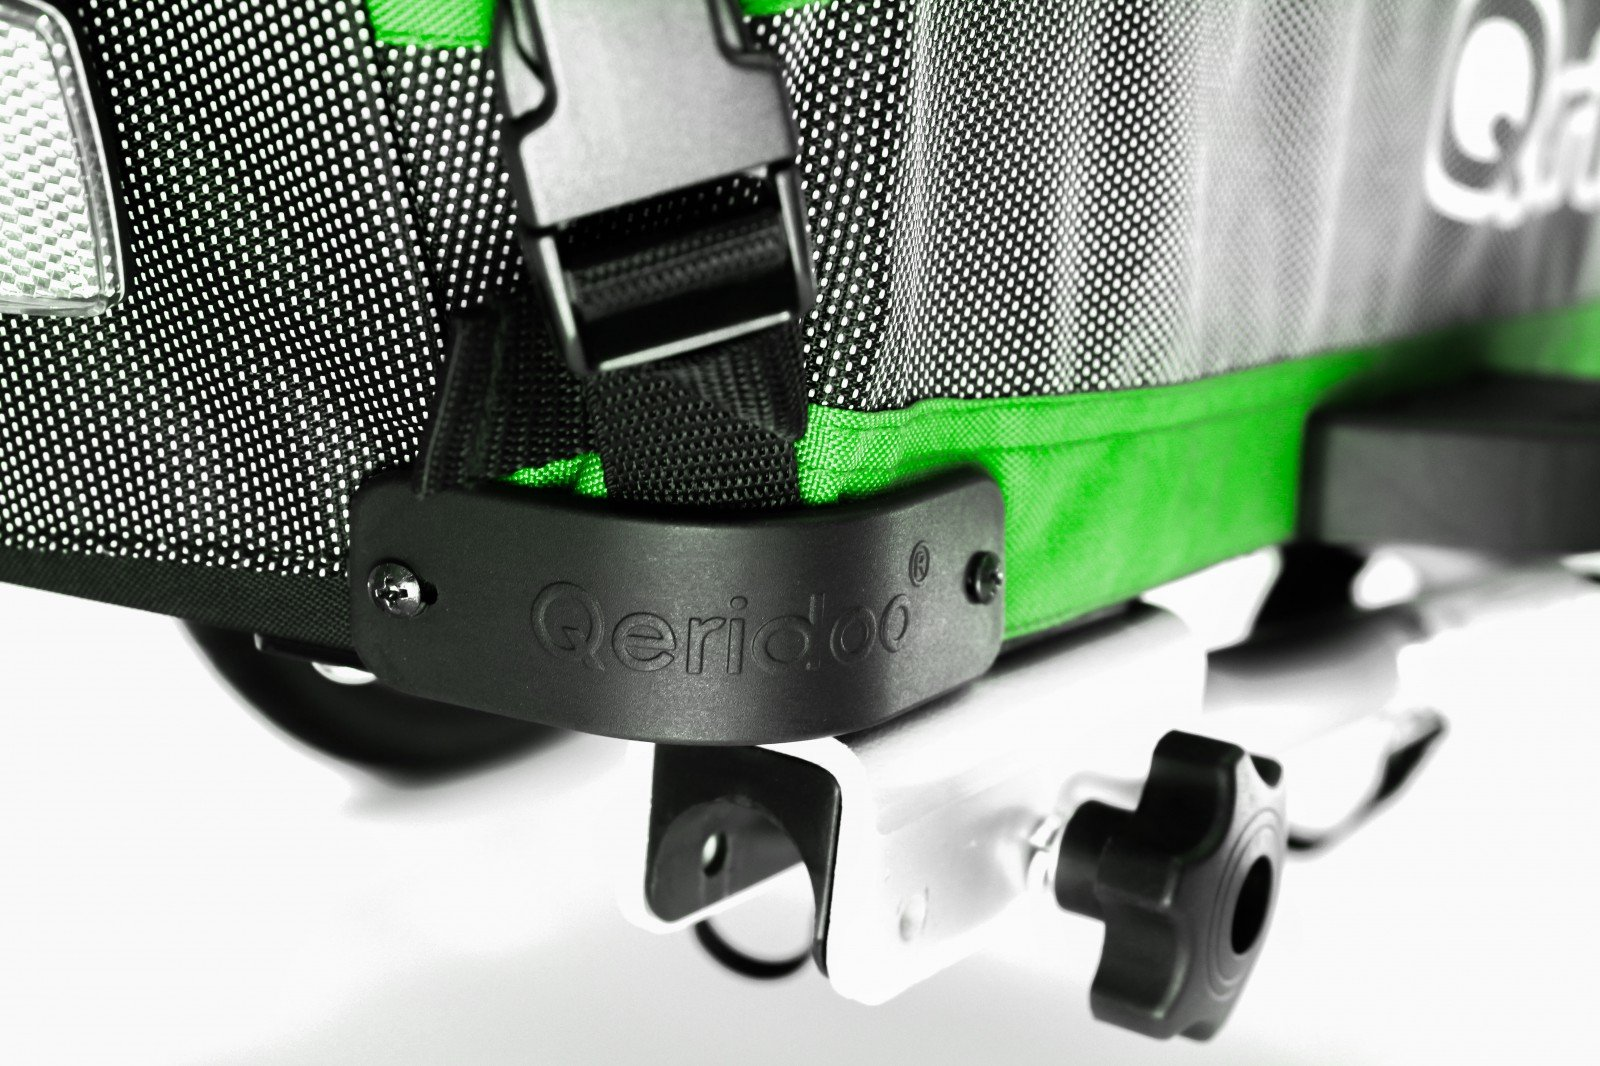 Jumbo-1 verde de bicicleta para niños remolque de aluminio qeridoo ...